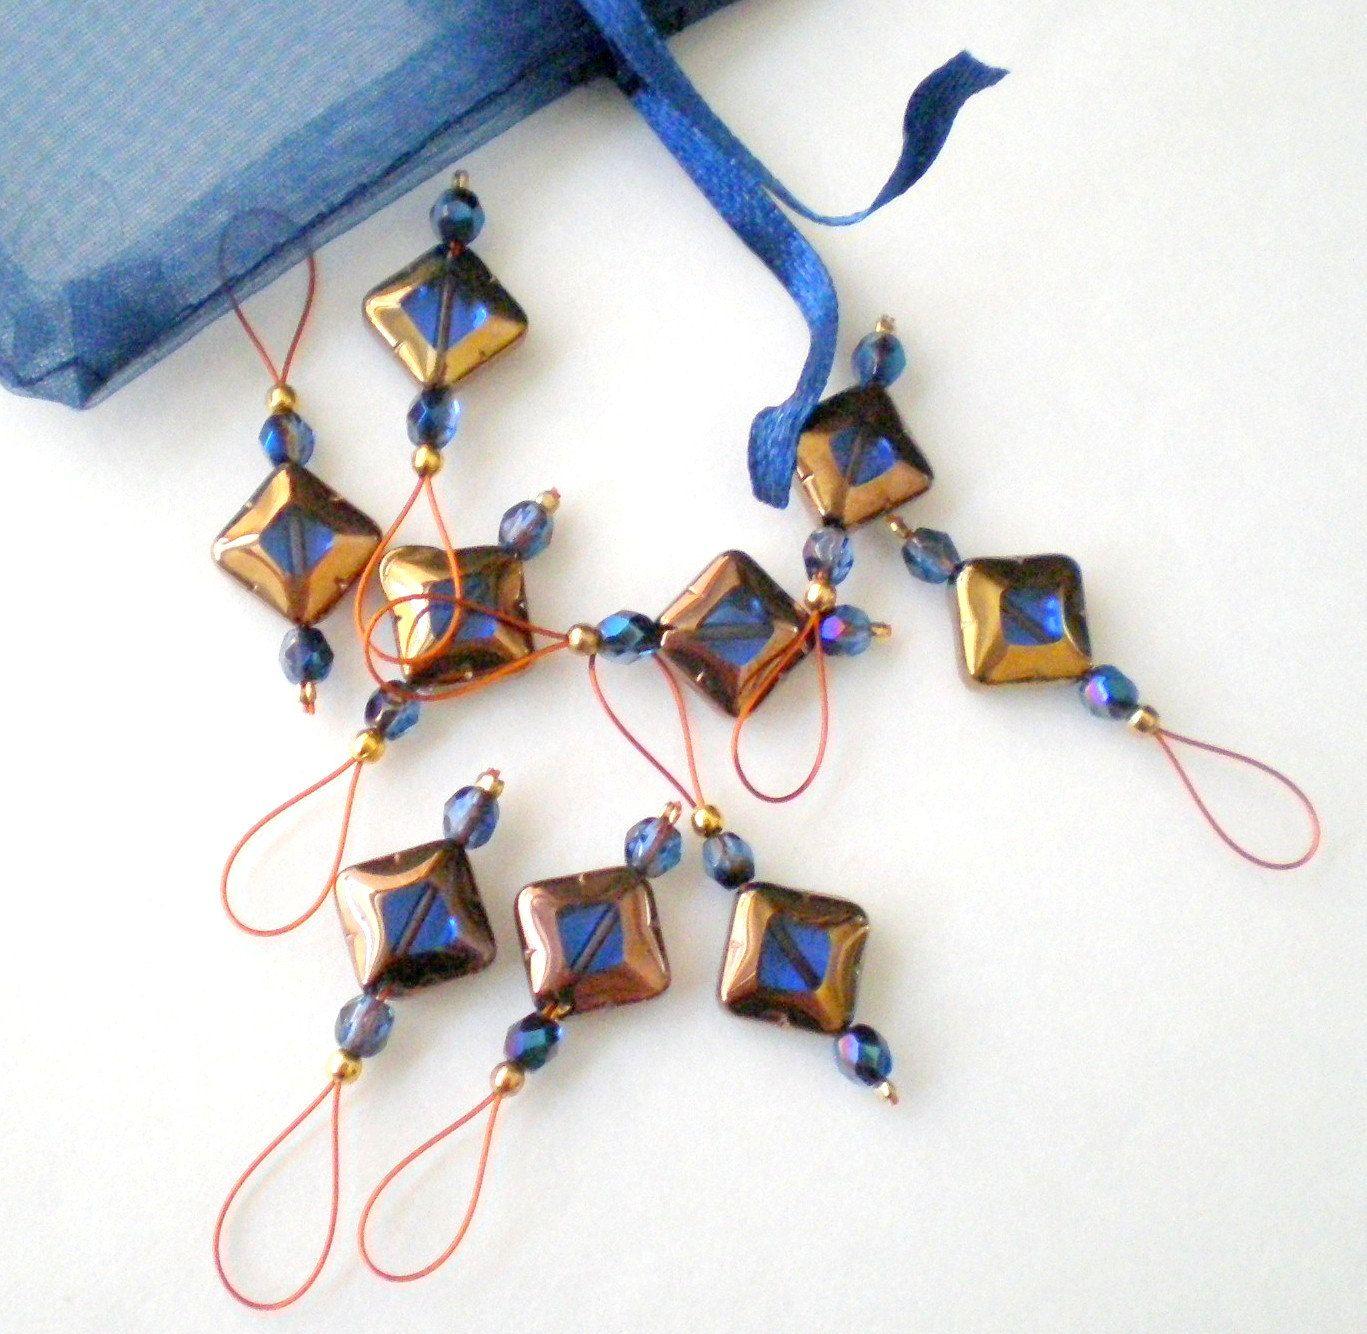 Knitting Markers Beads : Bead stitch markers set of handmade knitting